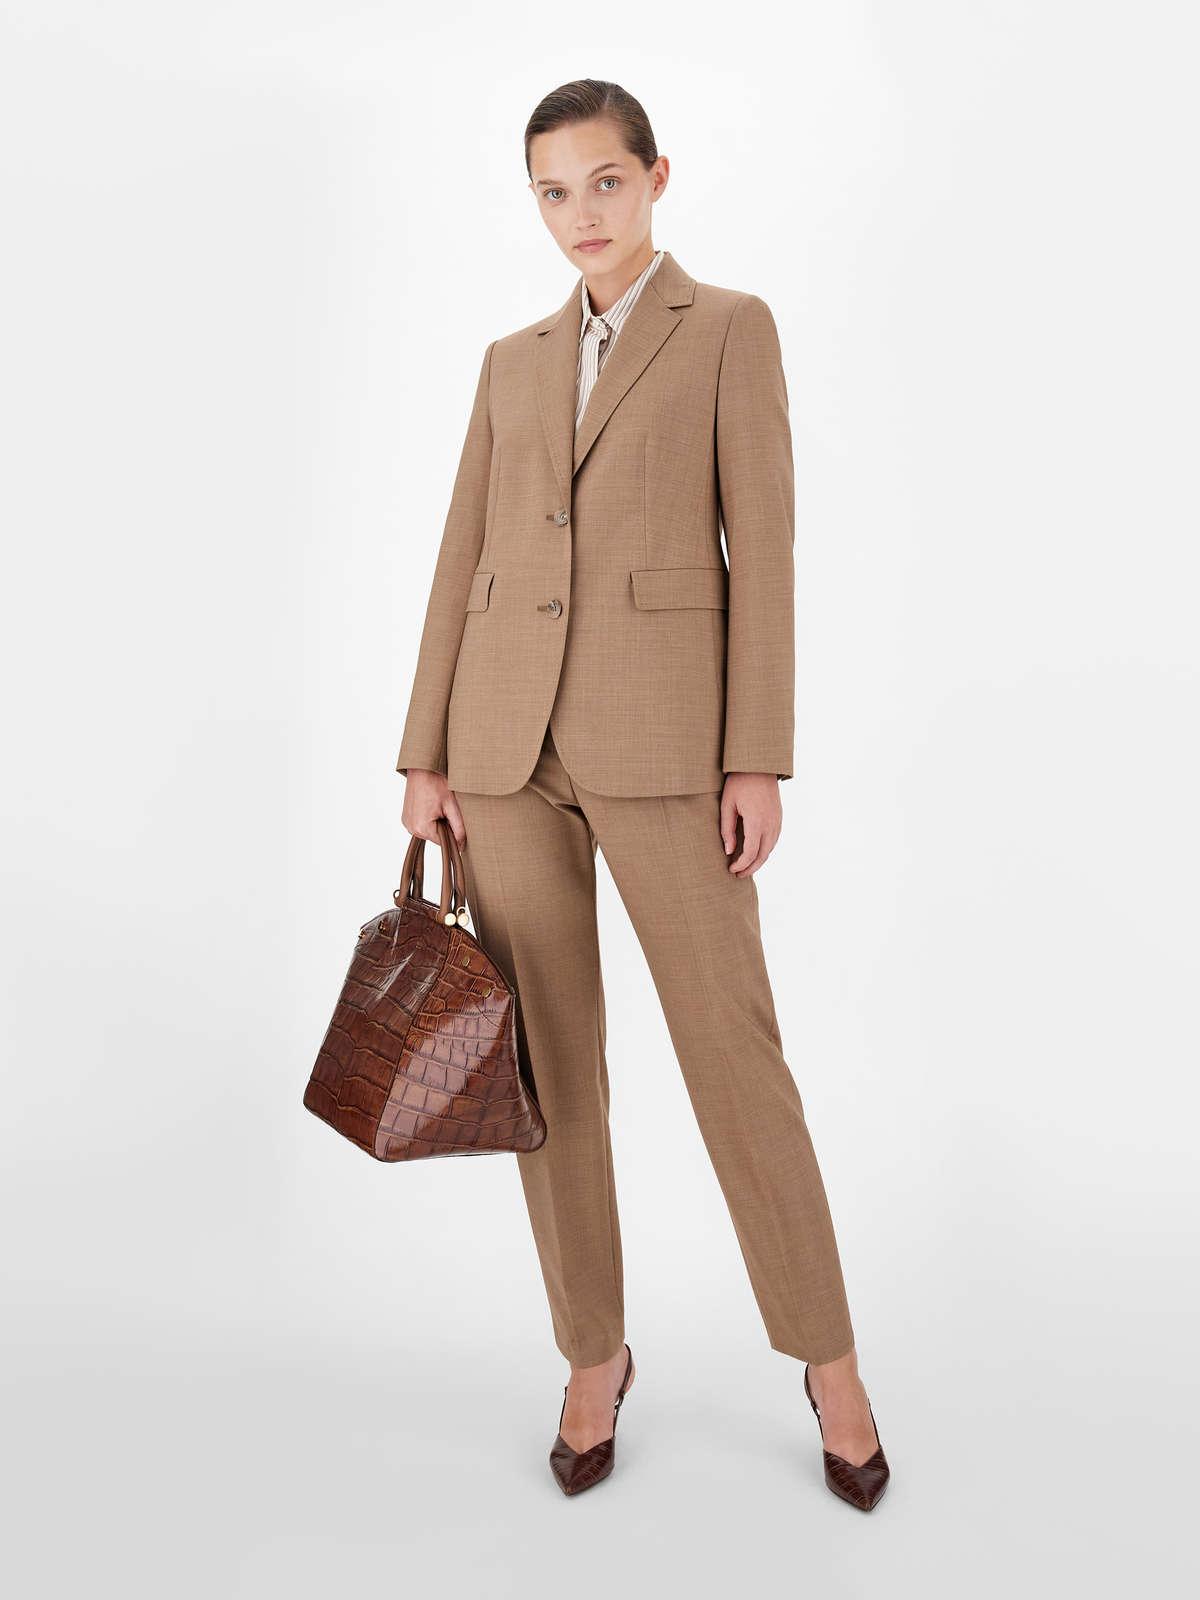 Pantaloni in tela di lana - Max Mara